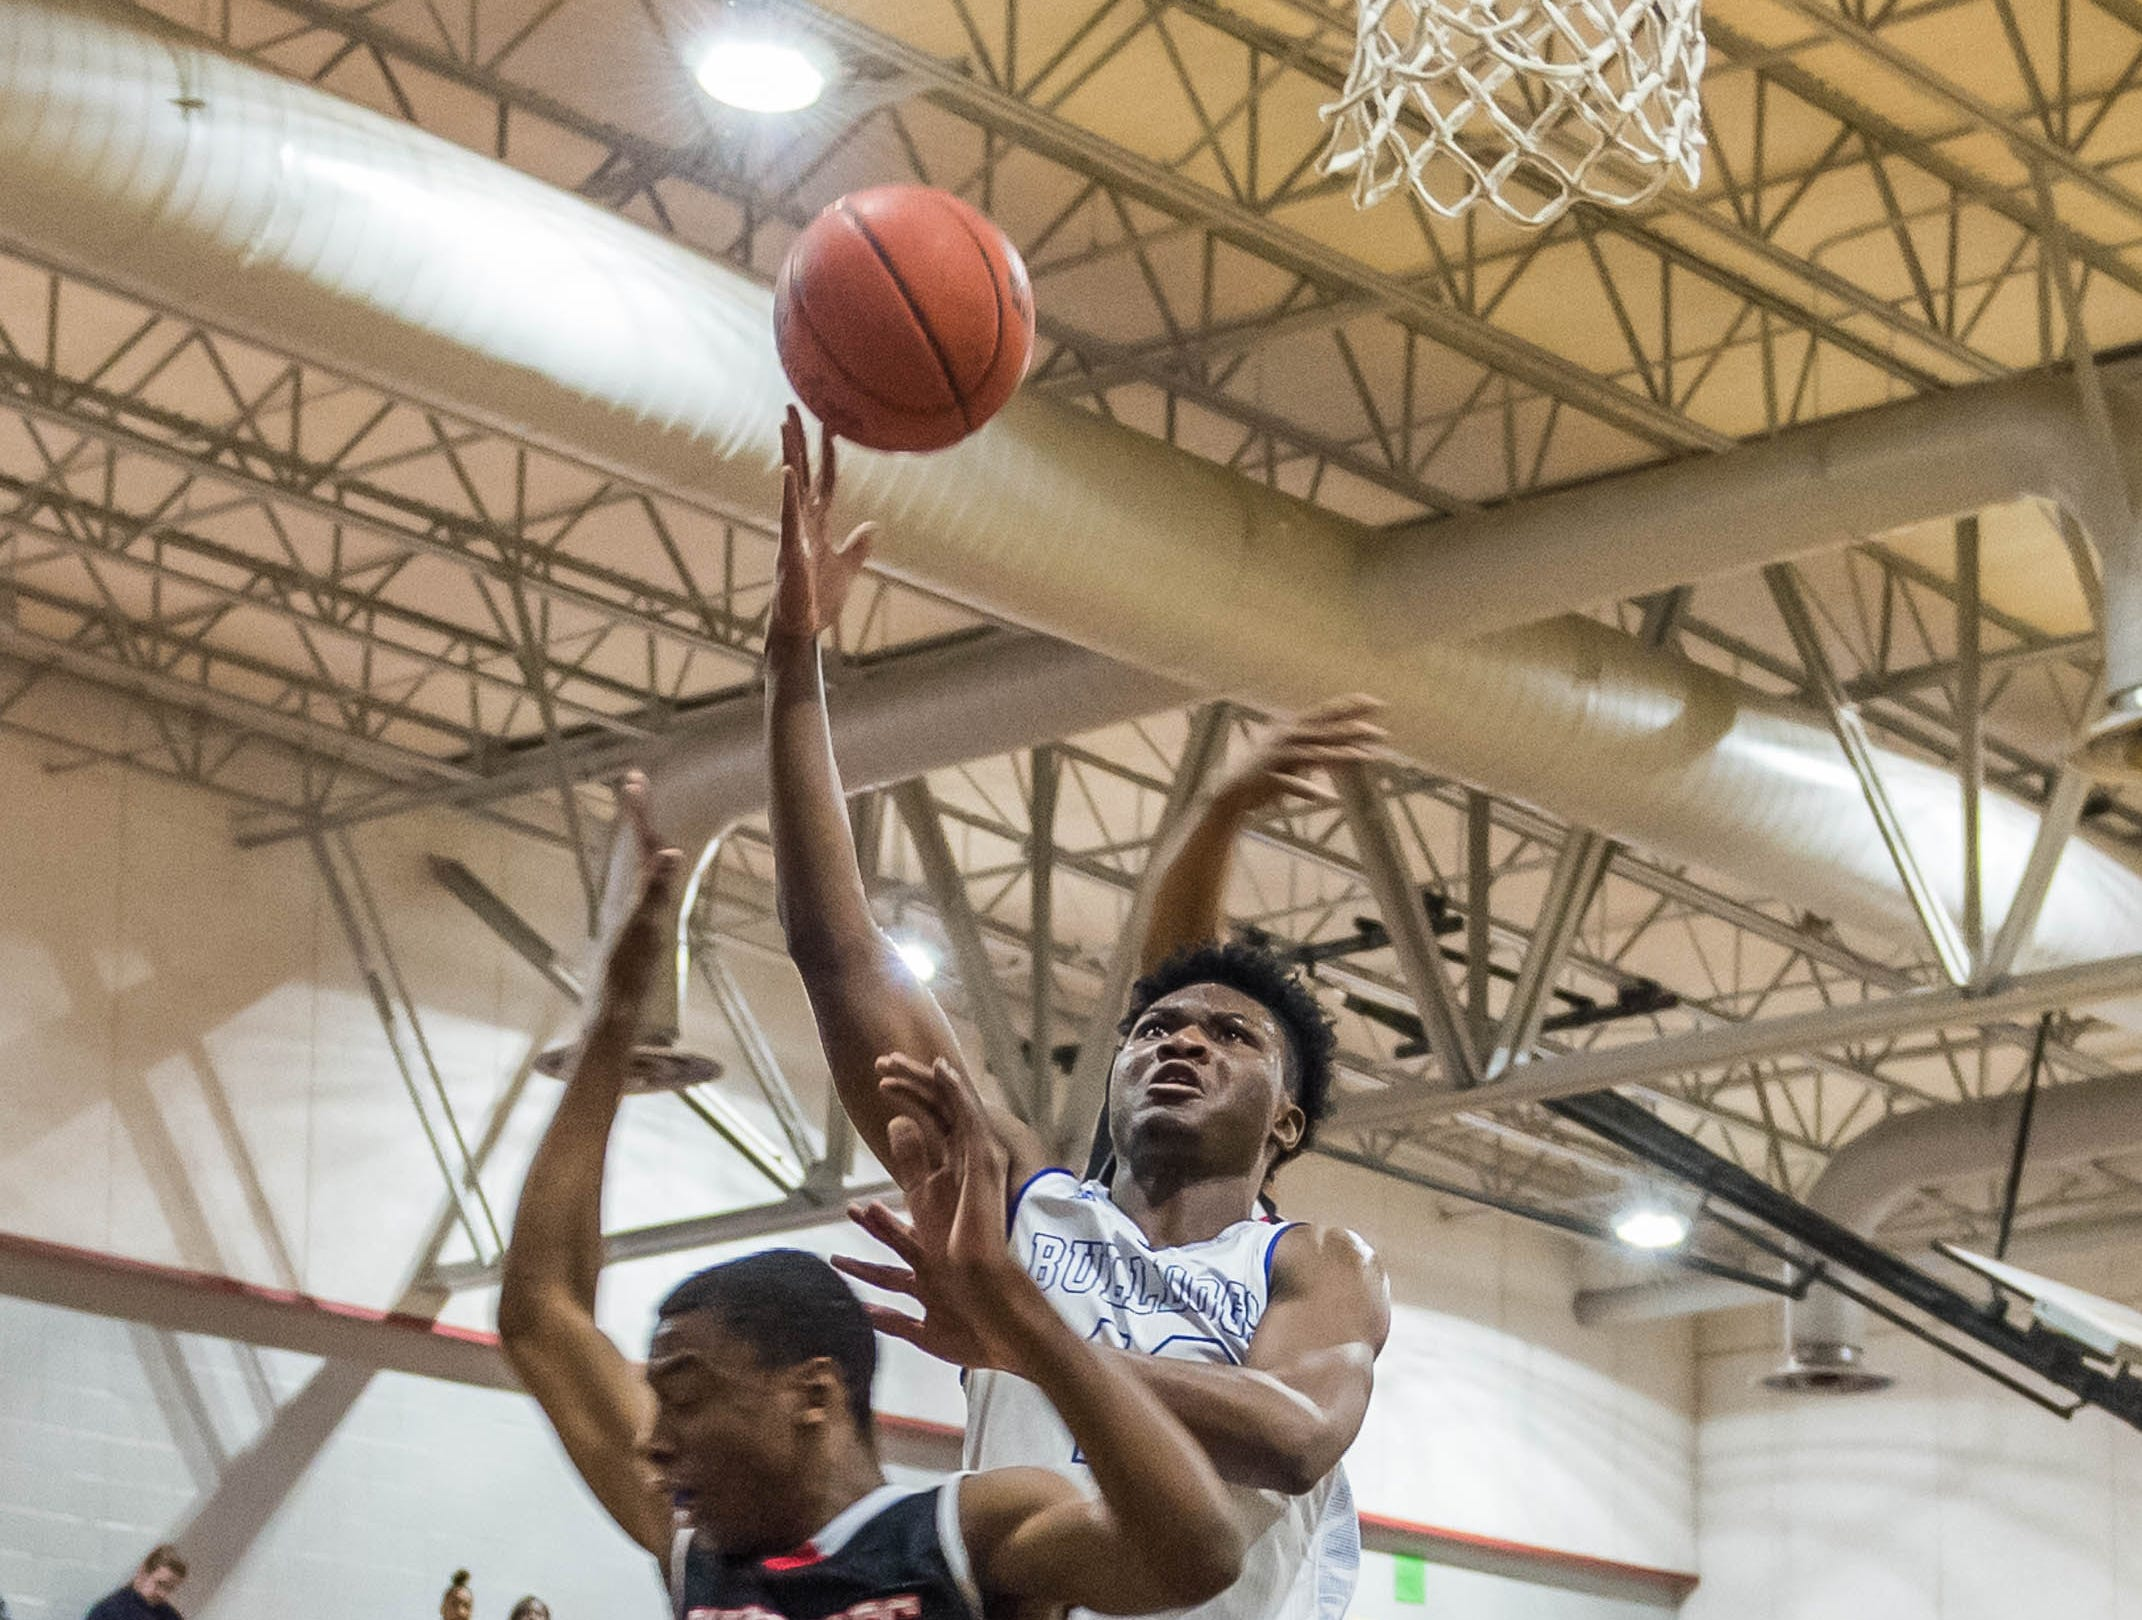 The David Thibodaux STEM Academy boys basketball team play Abbeville in a key 8-3A matchup on Friday, Jan. 25, 2019.